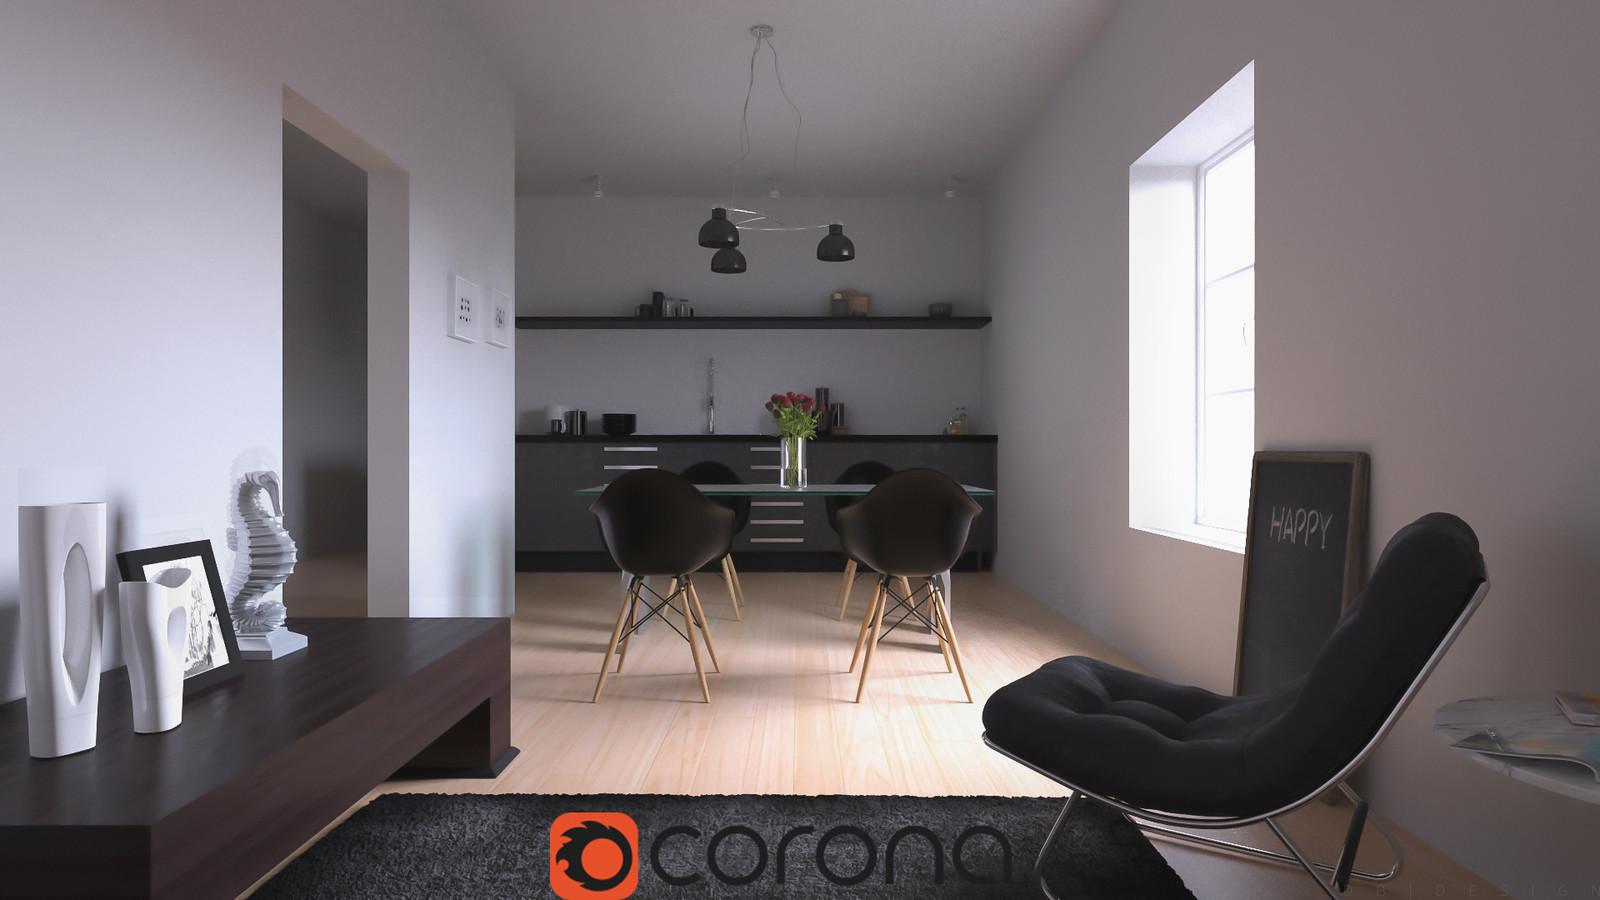 Modern Interior - Corona Renderer